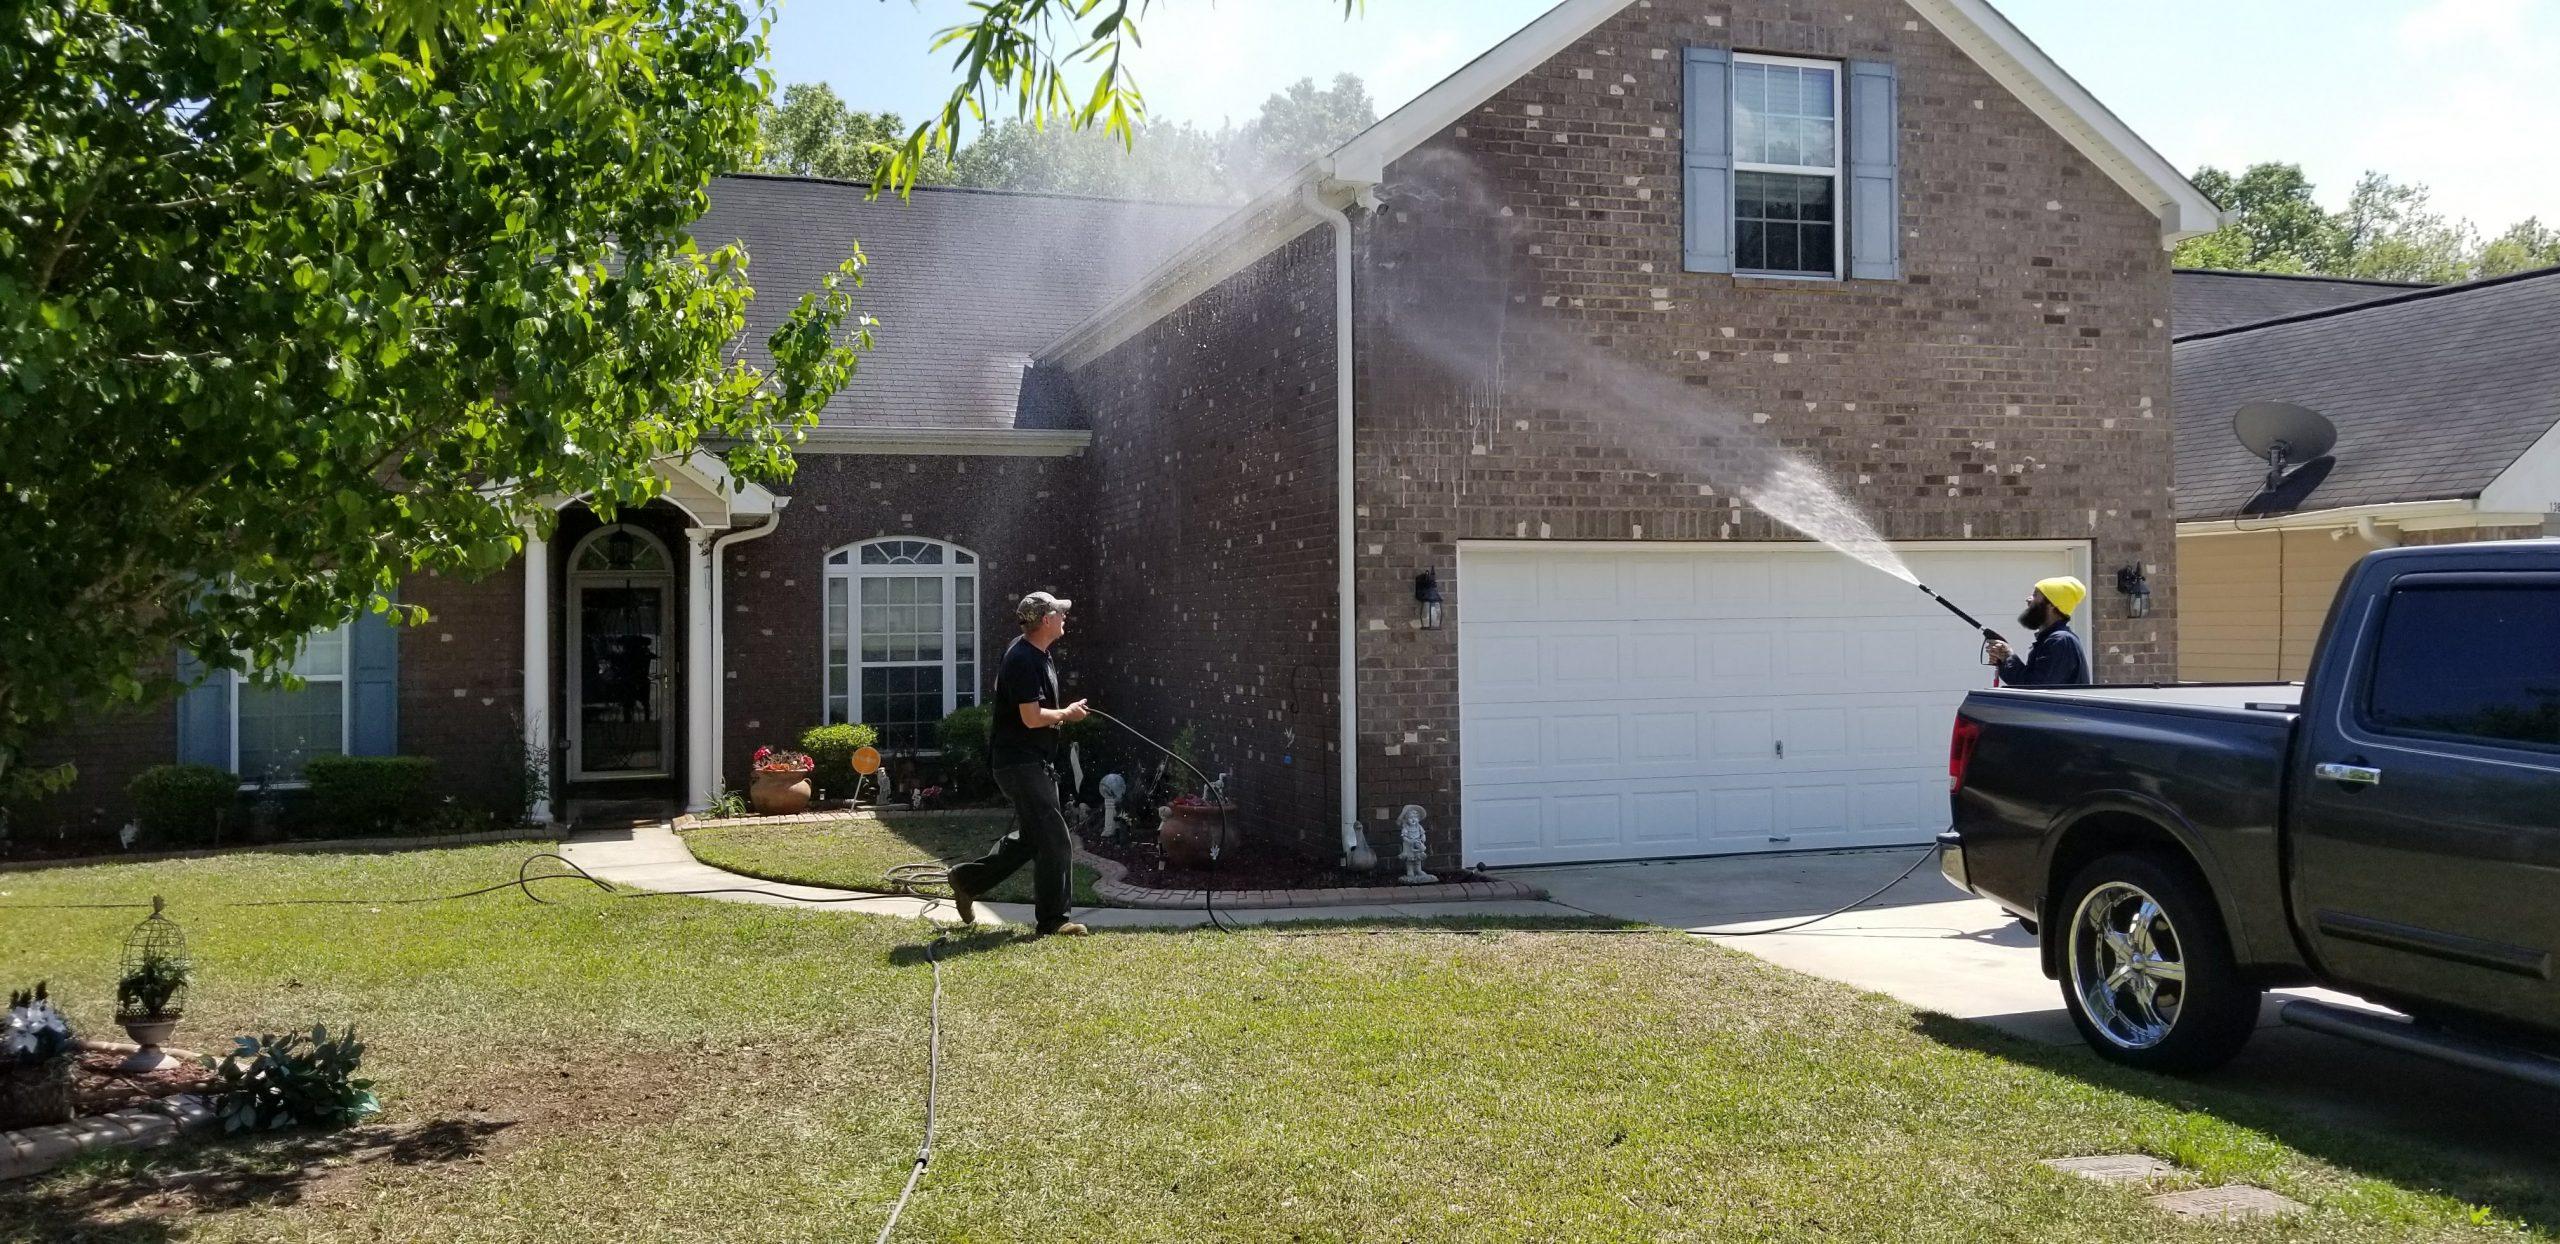 House Washing Services - Pressure Washing - Savannah, GA